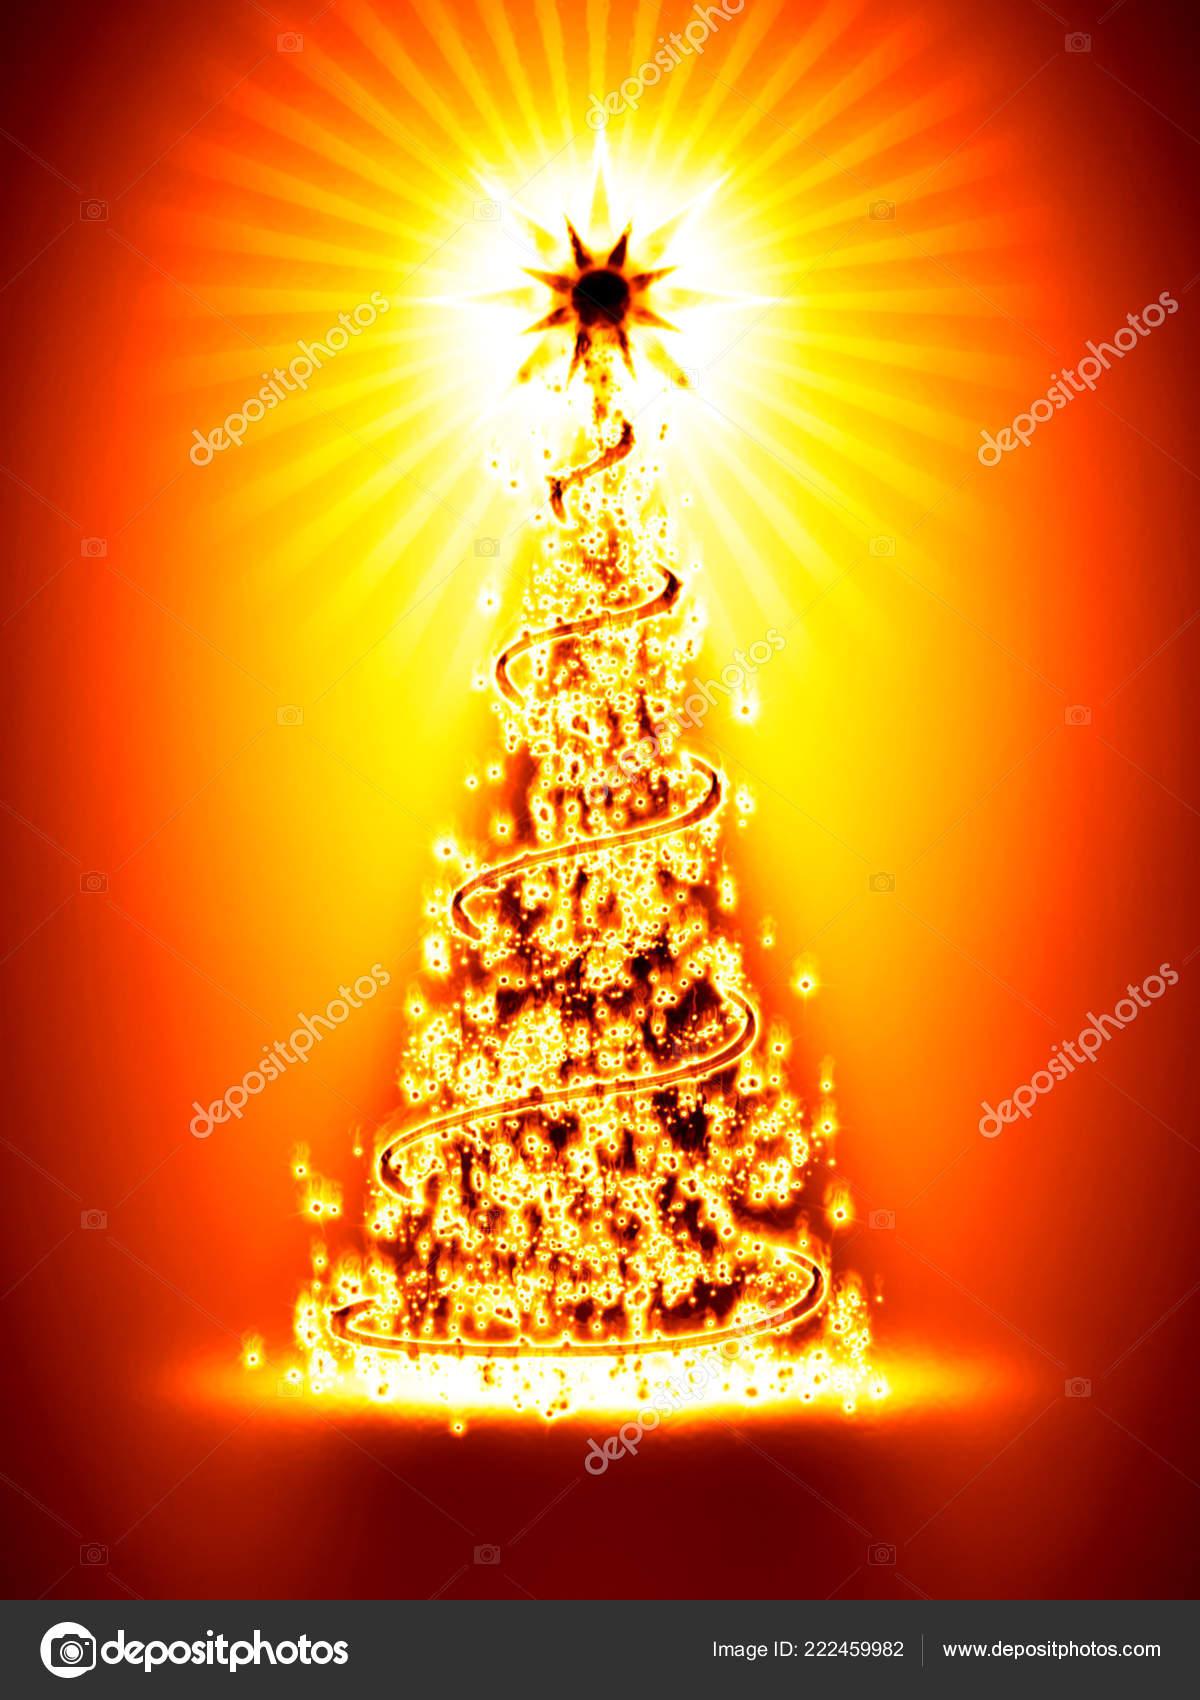 Burning Christmas Tree.Burning Christmas Tree Orange Background Stock Photo